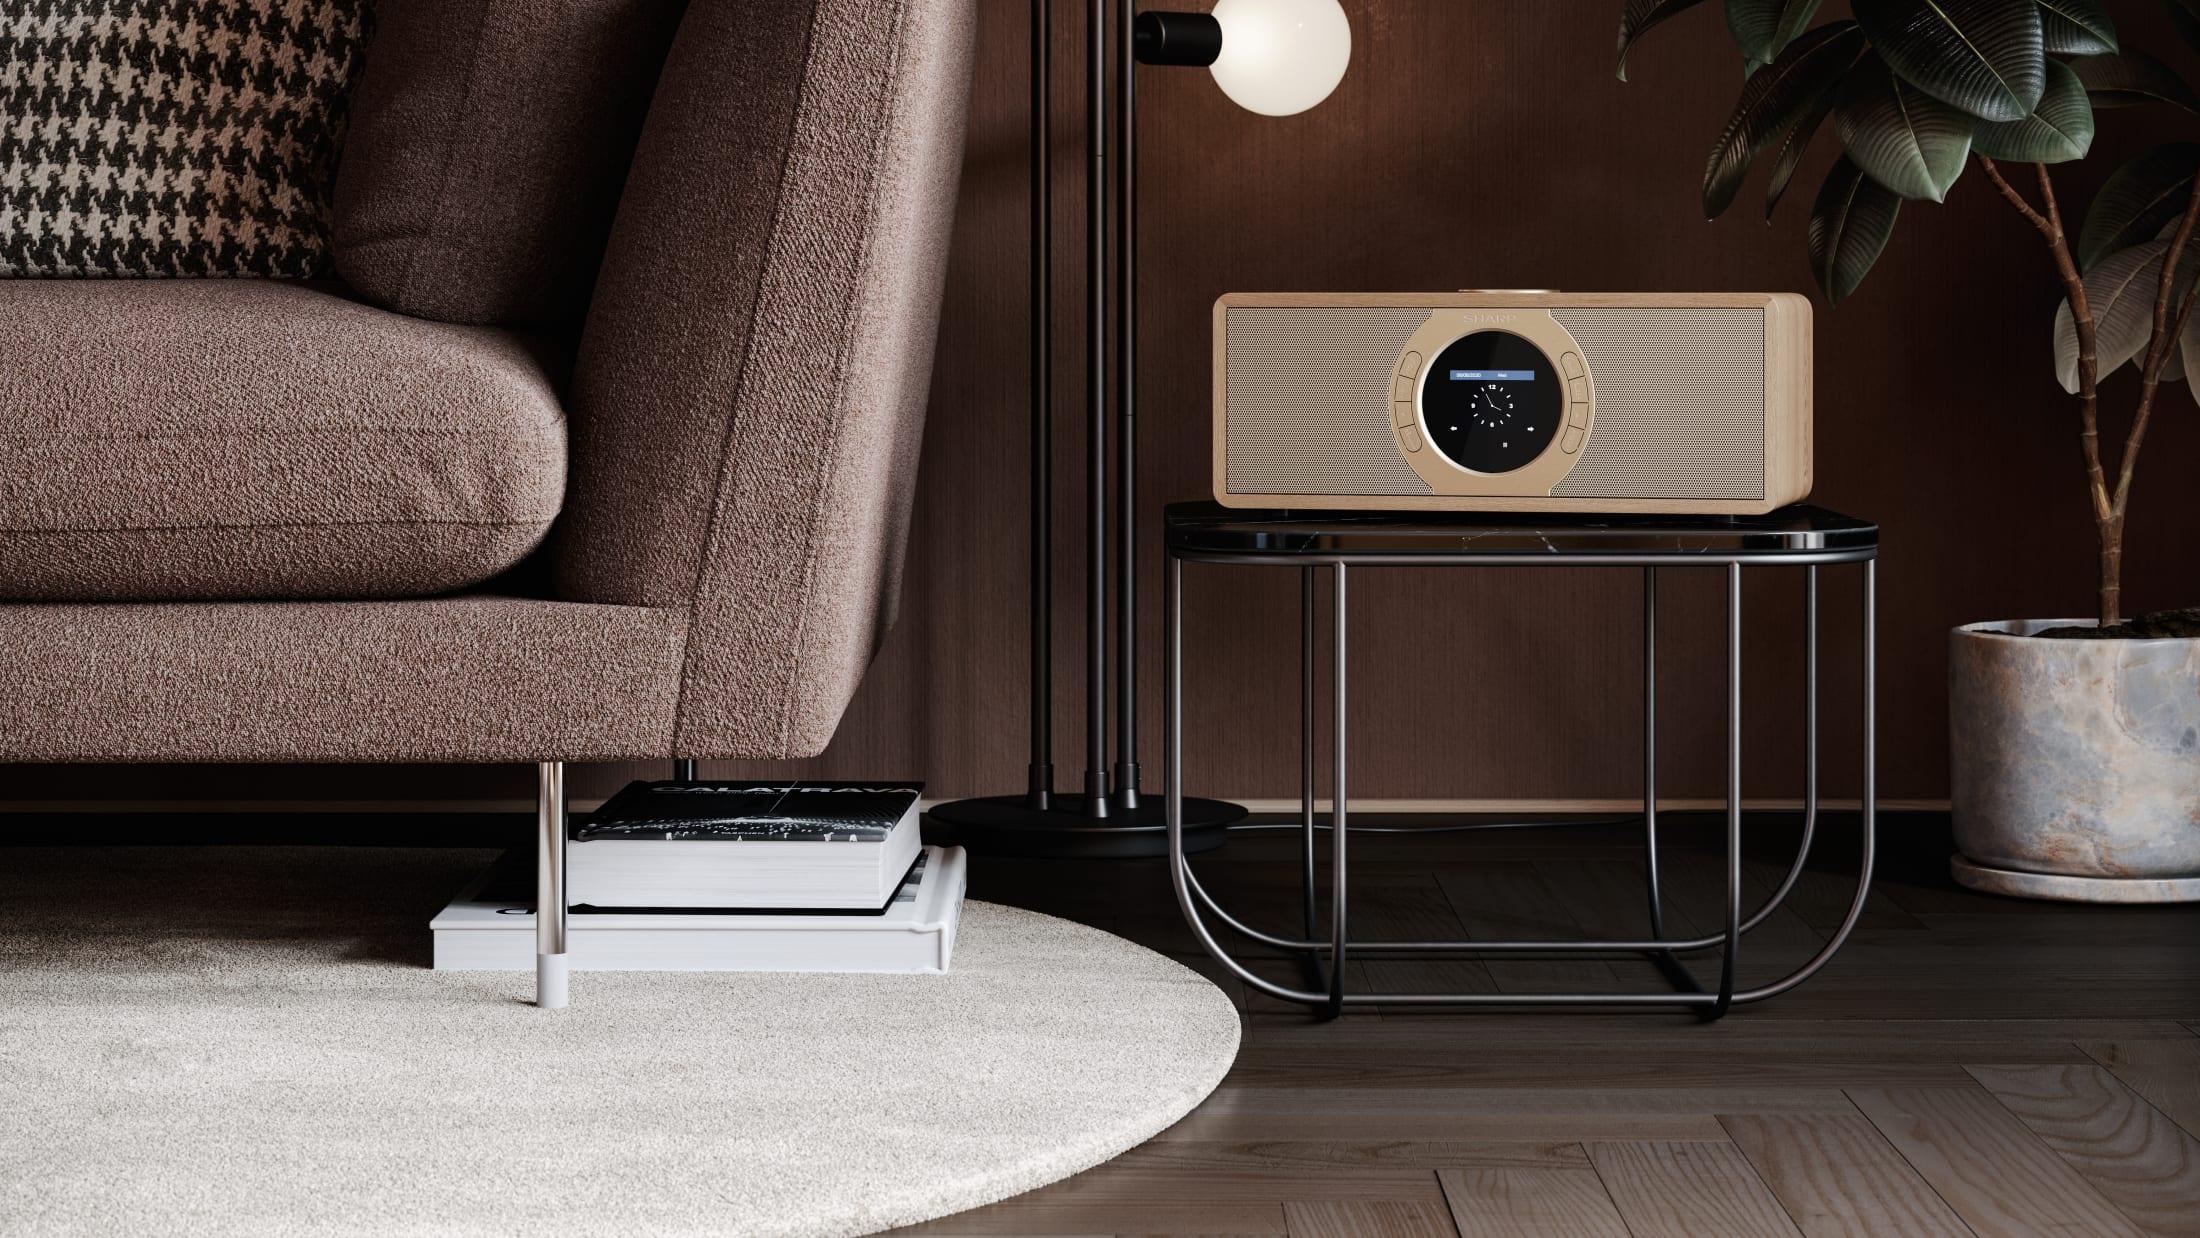 Stereo Internet-/Digitalradio DAB/DAB+/FM with RDS, 30 W, Spotify, Bluetooth and 60 station memory.